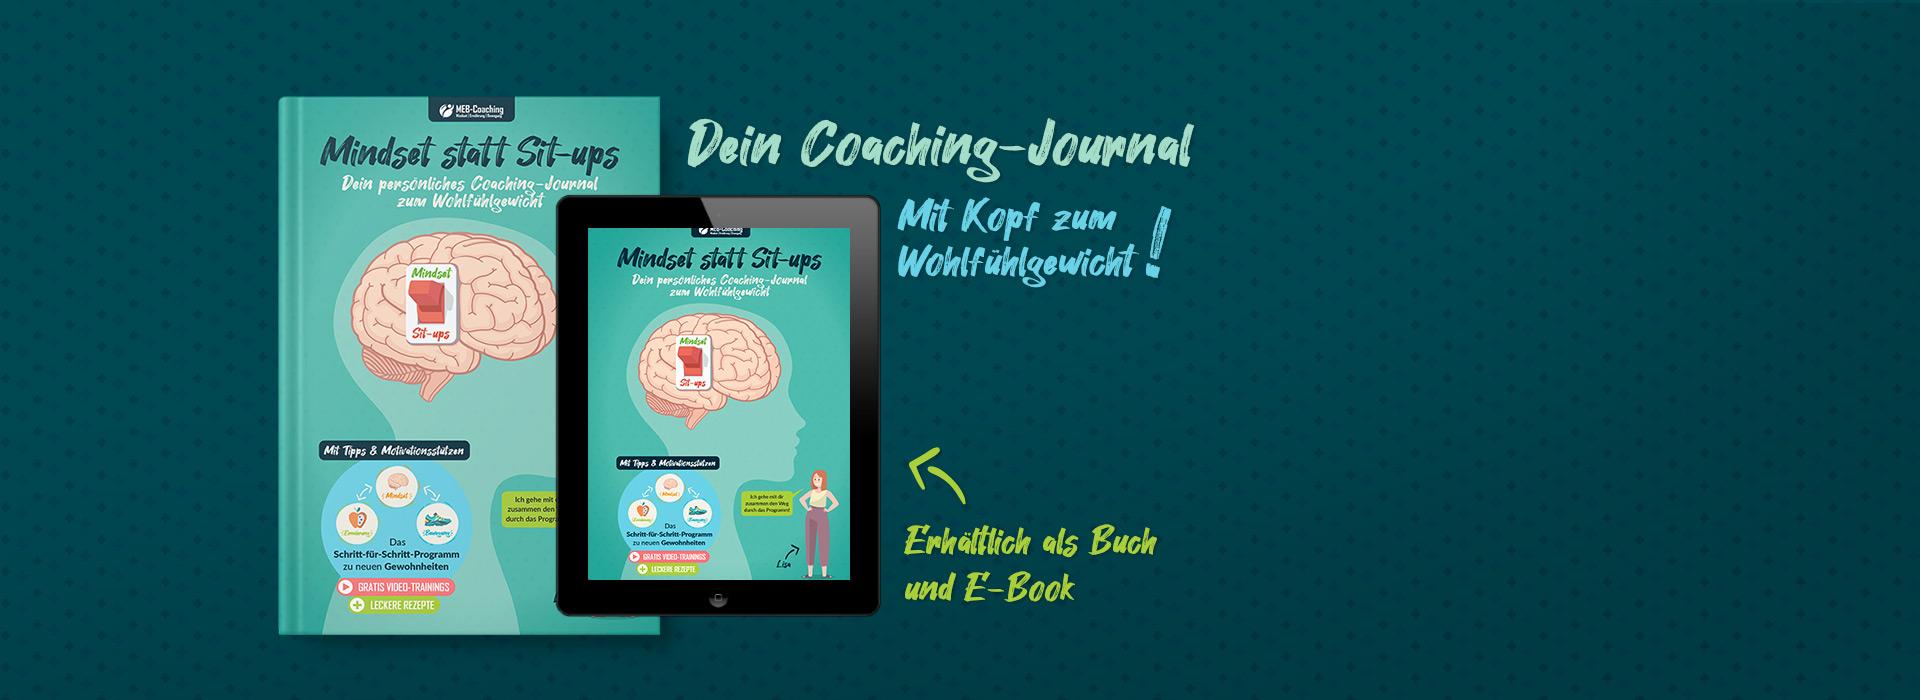 MEB-Coaching